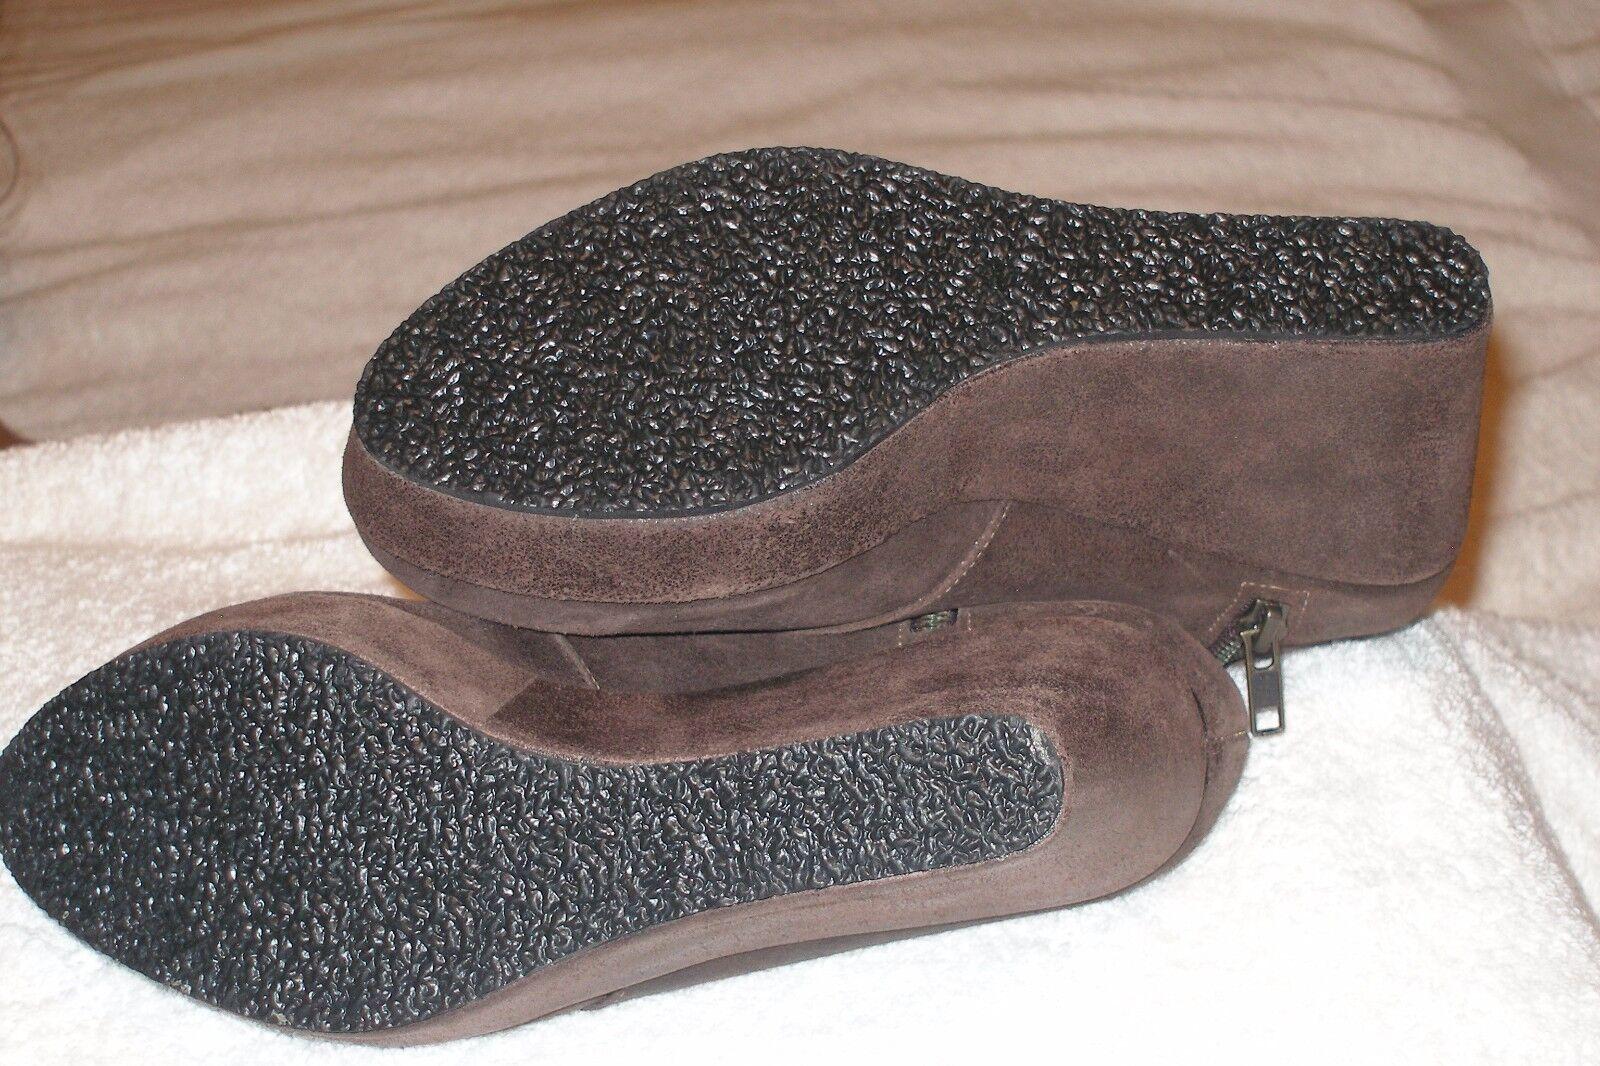 Cordani Faith Brown Boots 7M  New New New  363 7c1359